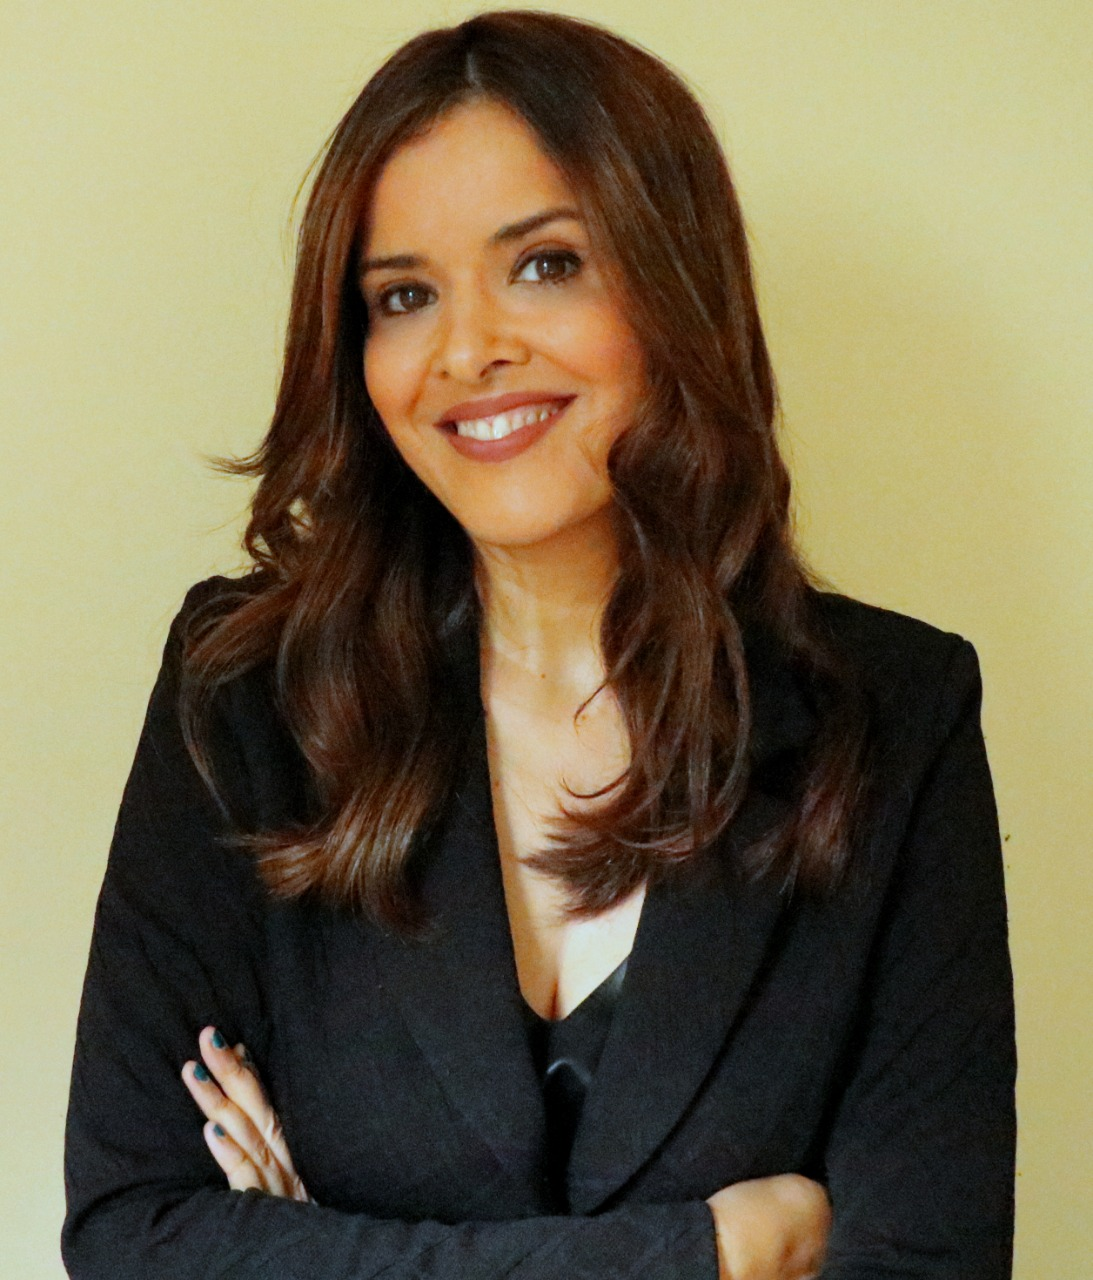 3 ELIETE OLIVEIRA - Palestrante Eliete Oliveira